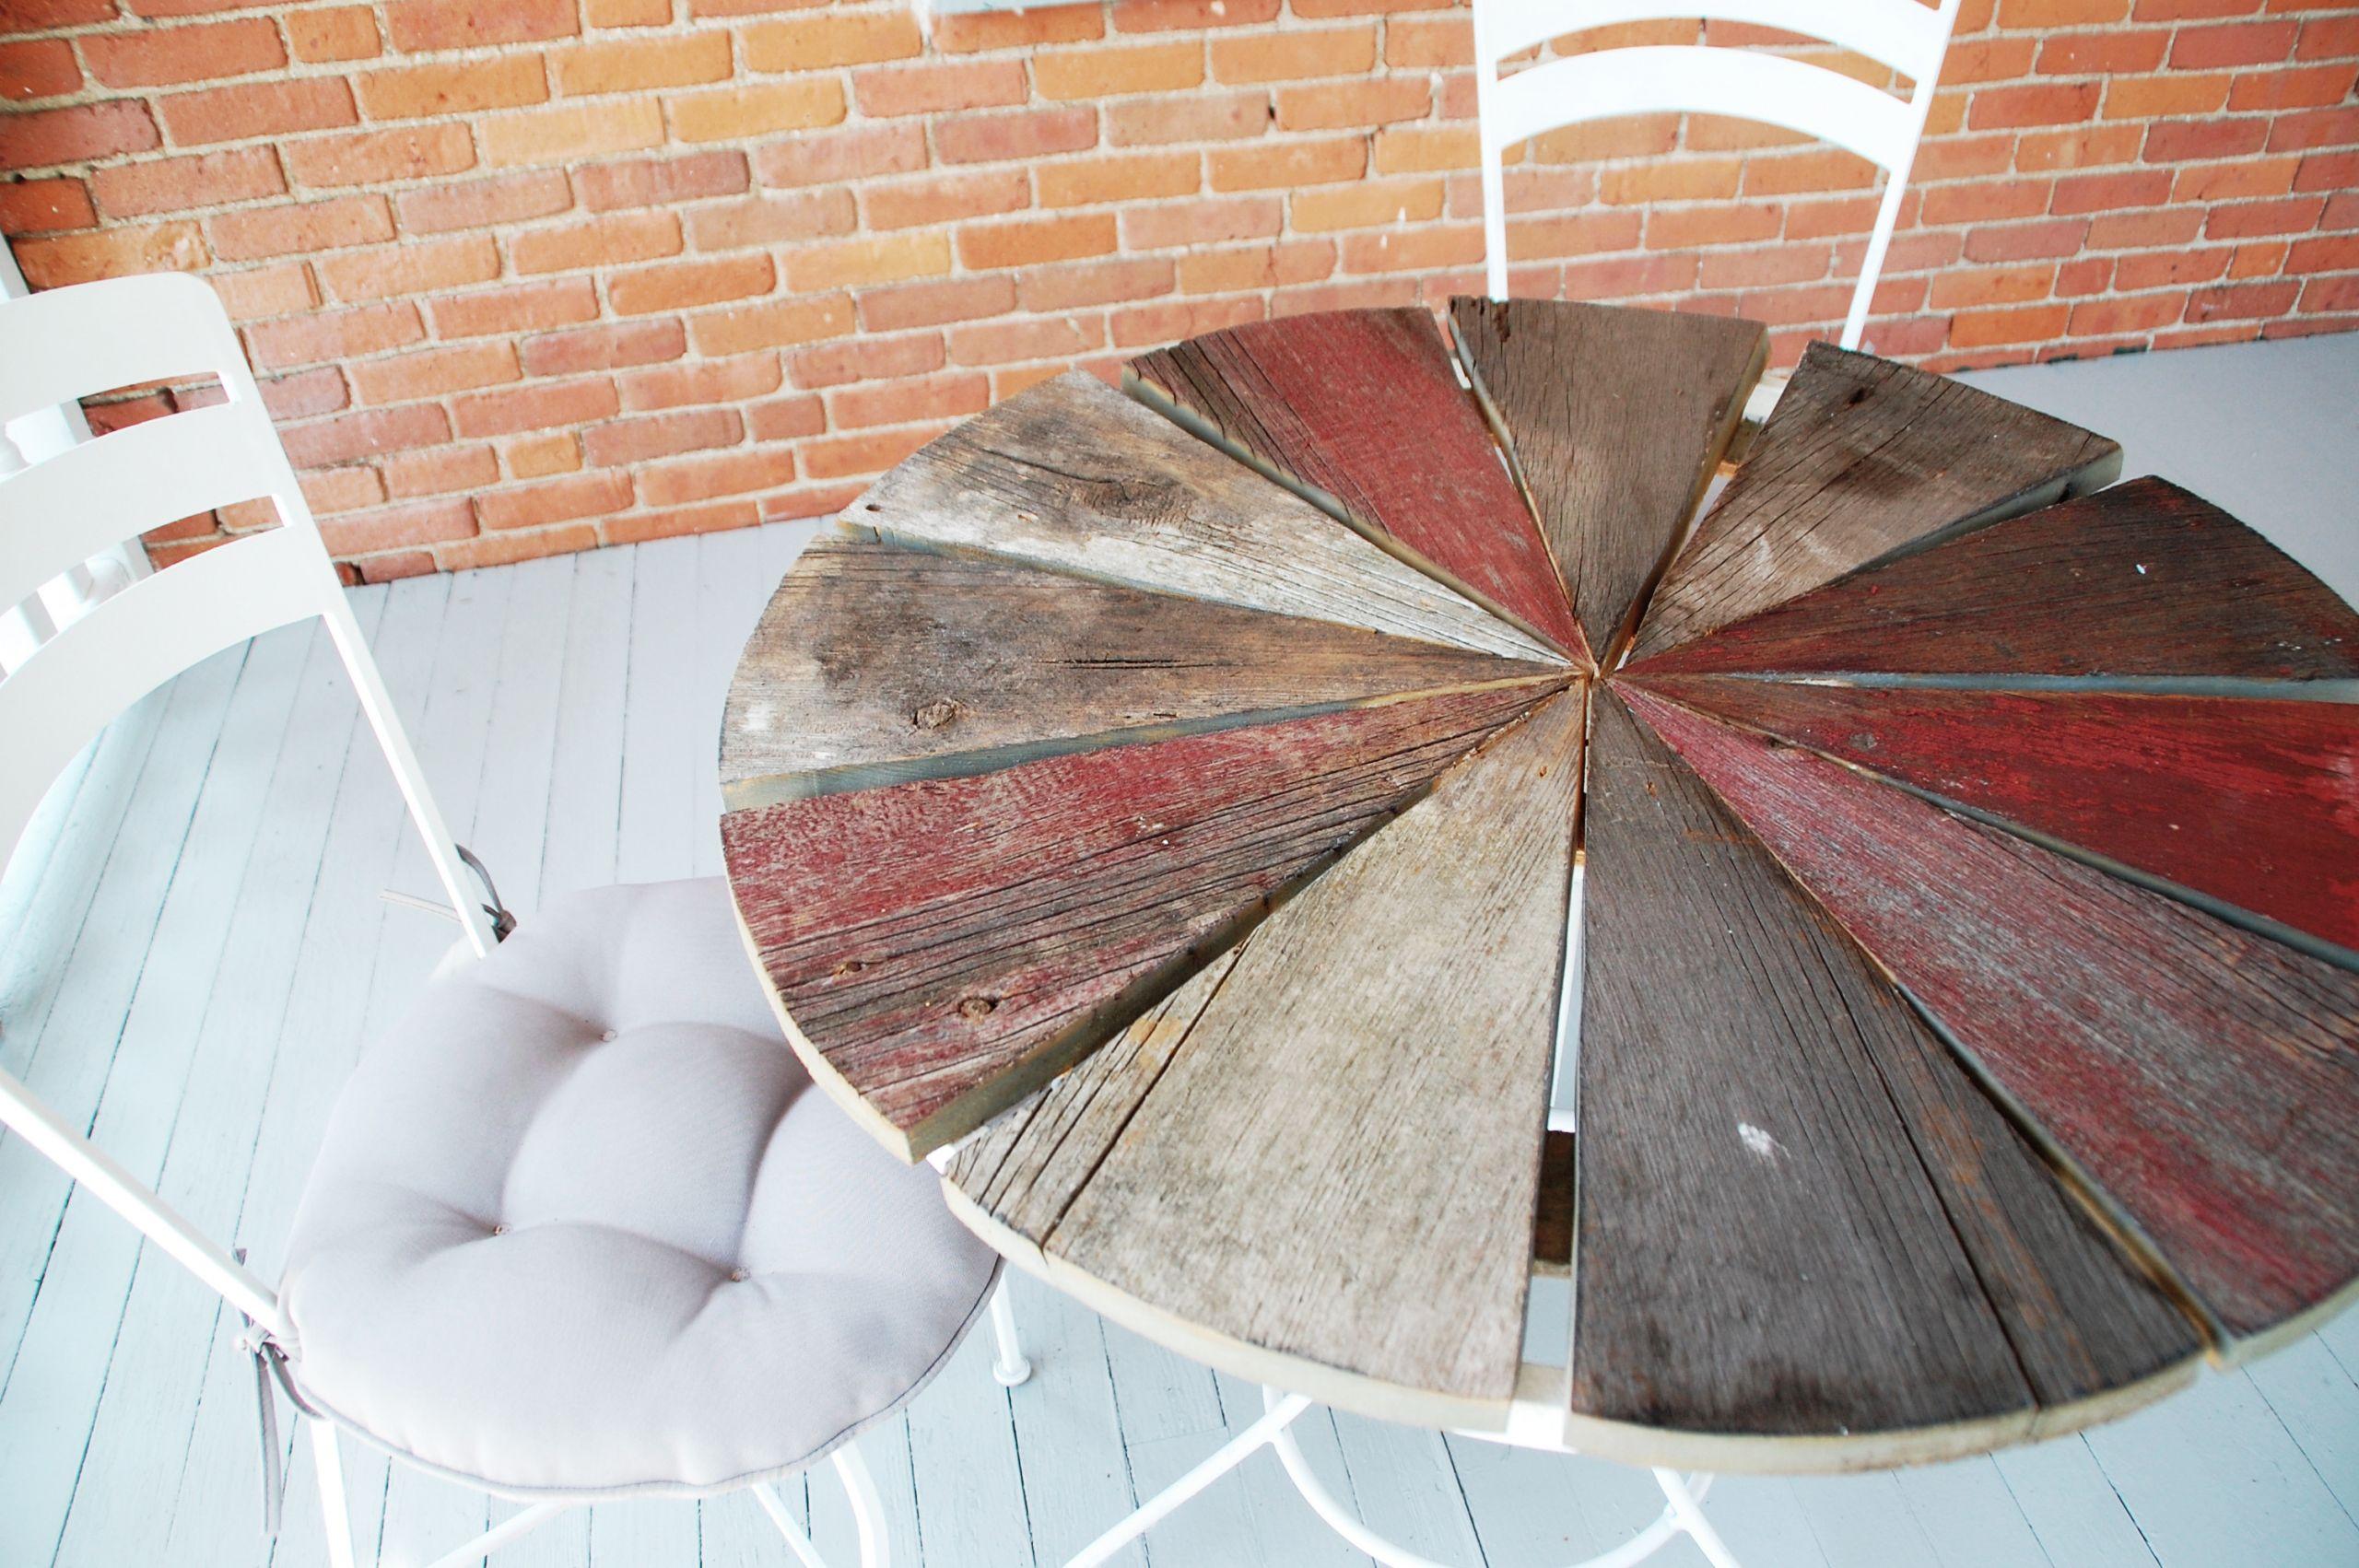 DIY Outdoor Wooden Table  Weekend DIY Project Rustic Wood Patio Table DIYdiva